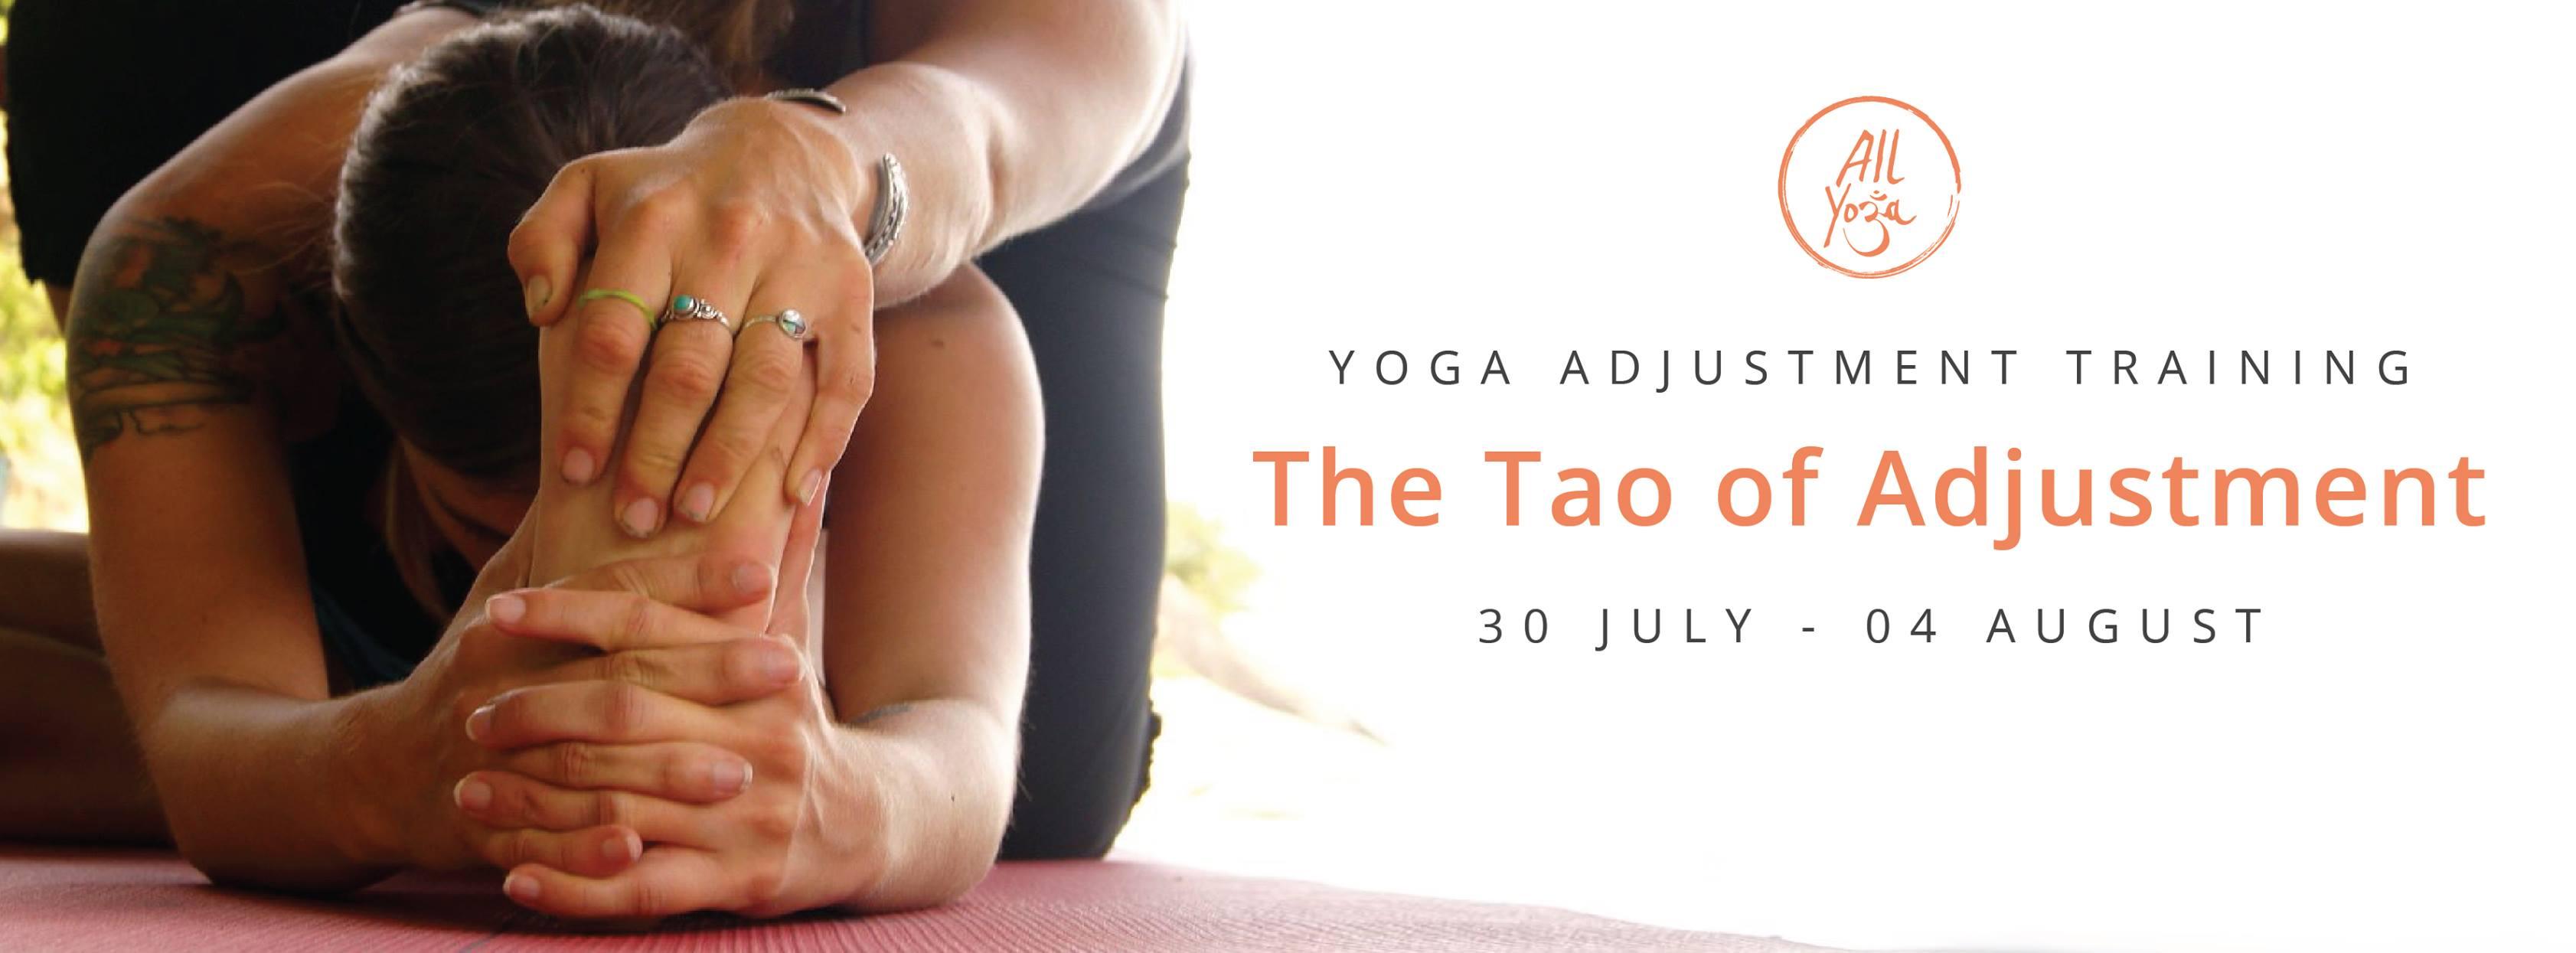 all-yoga-thailand-3